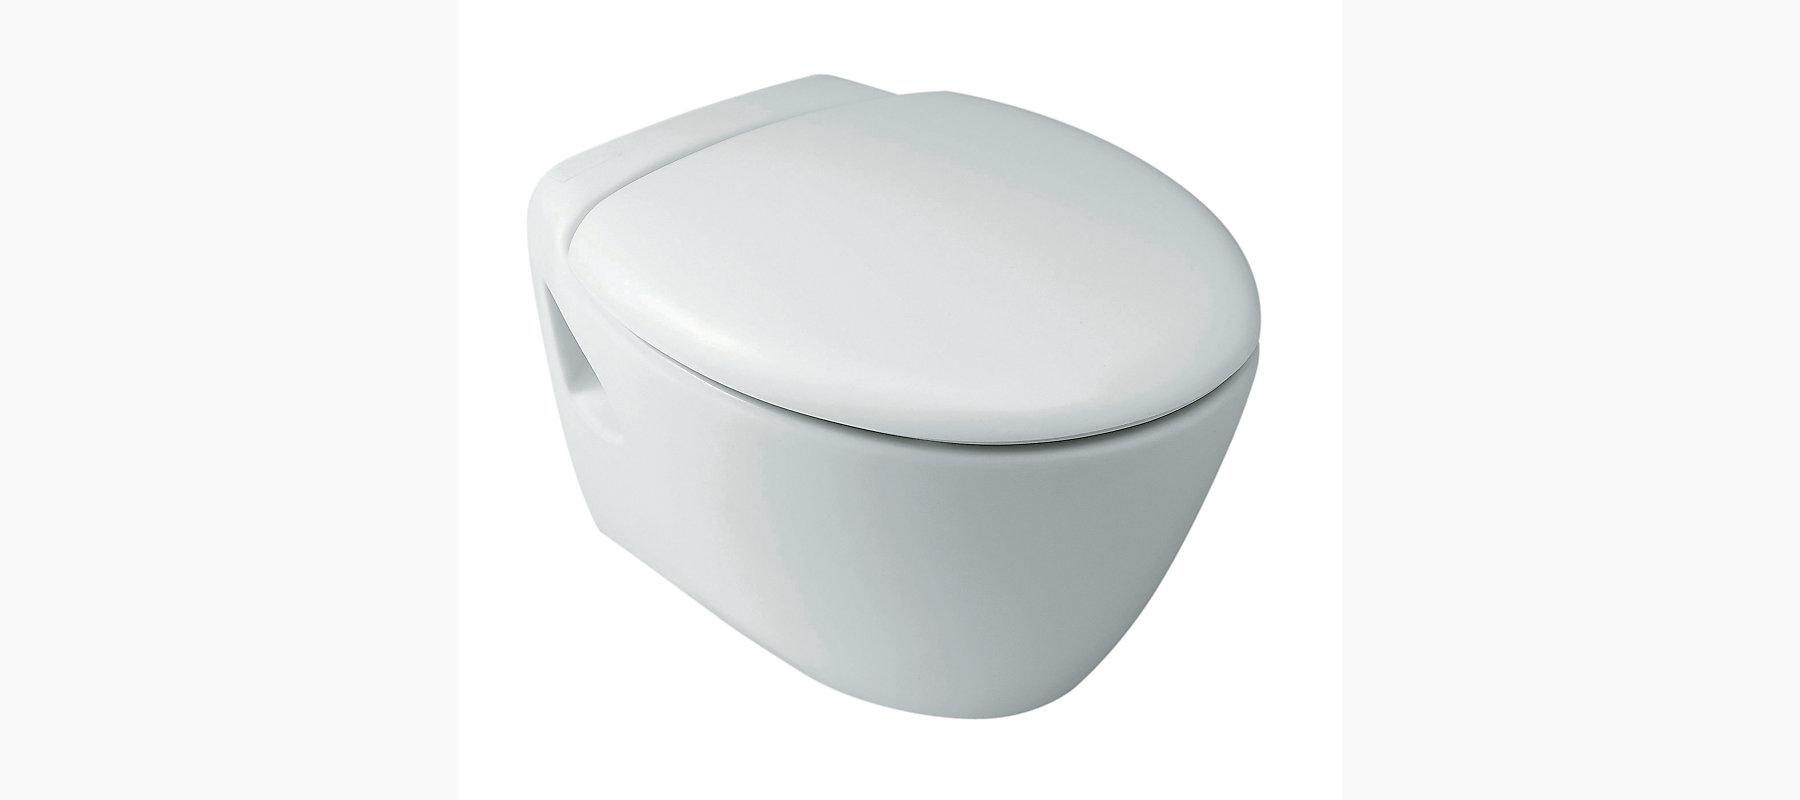 Presqu Ile Wall Hung Toilet With Quiet Close Tm Seat K